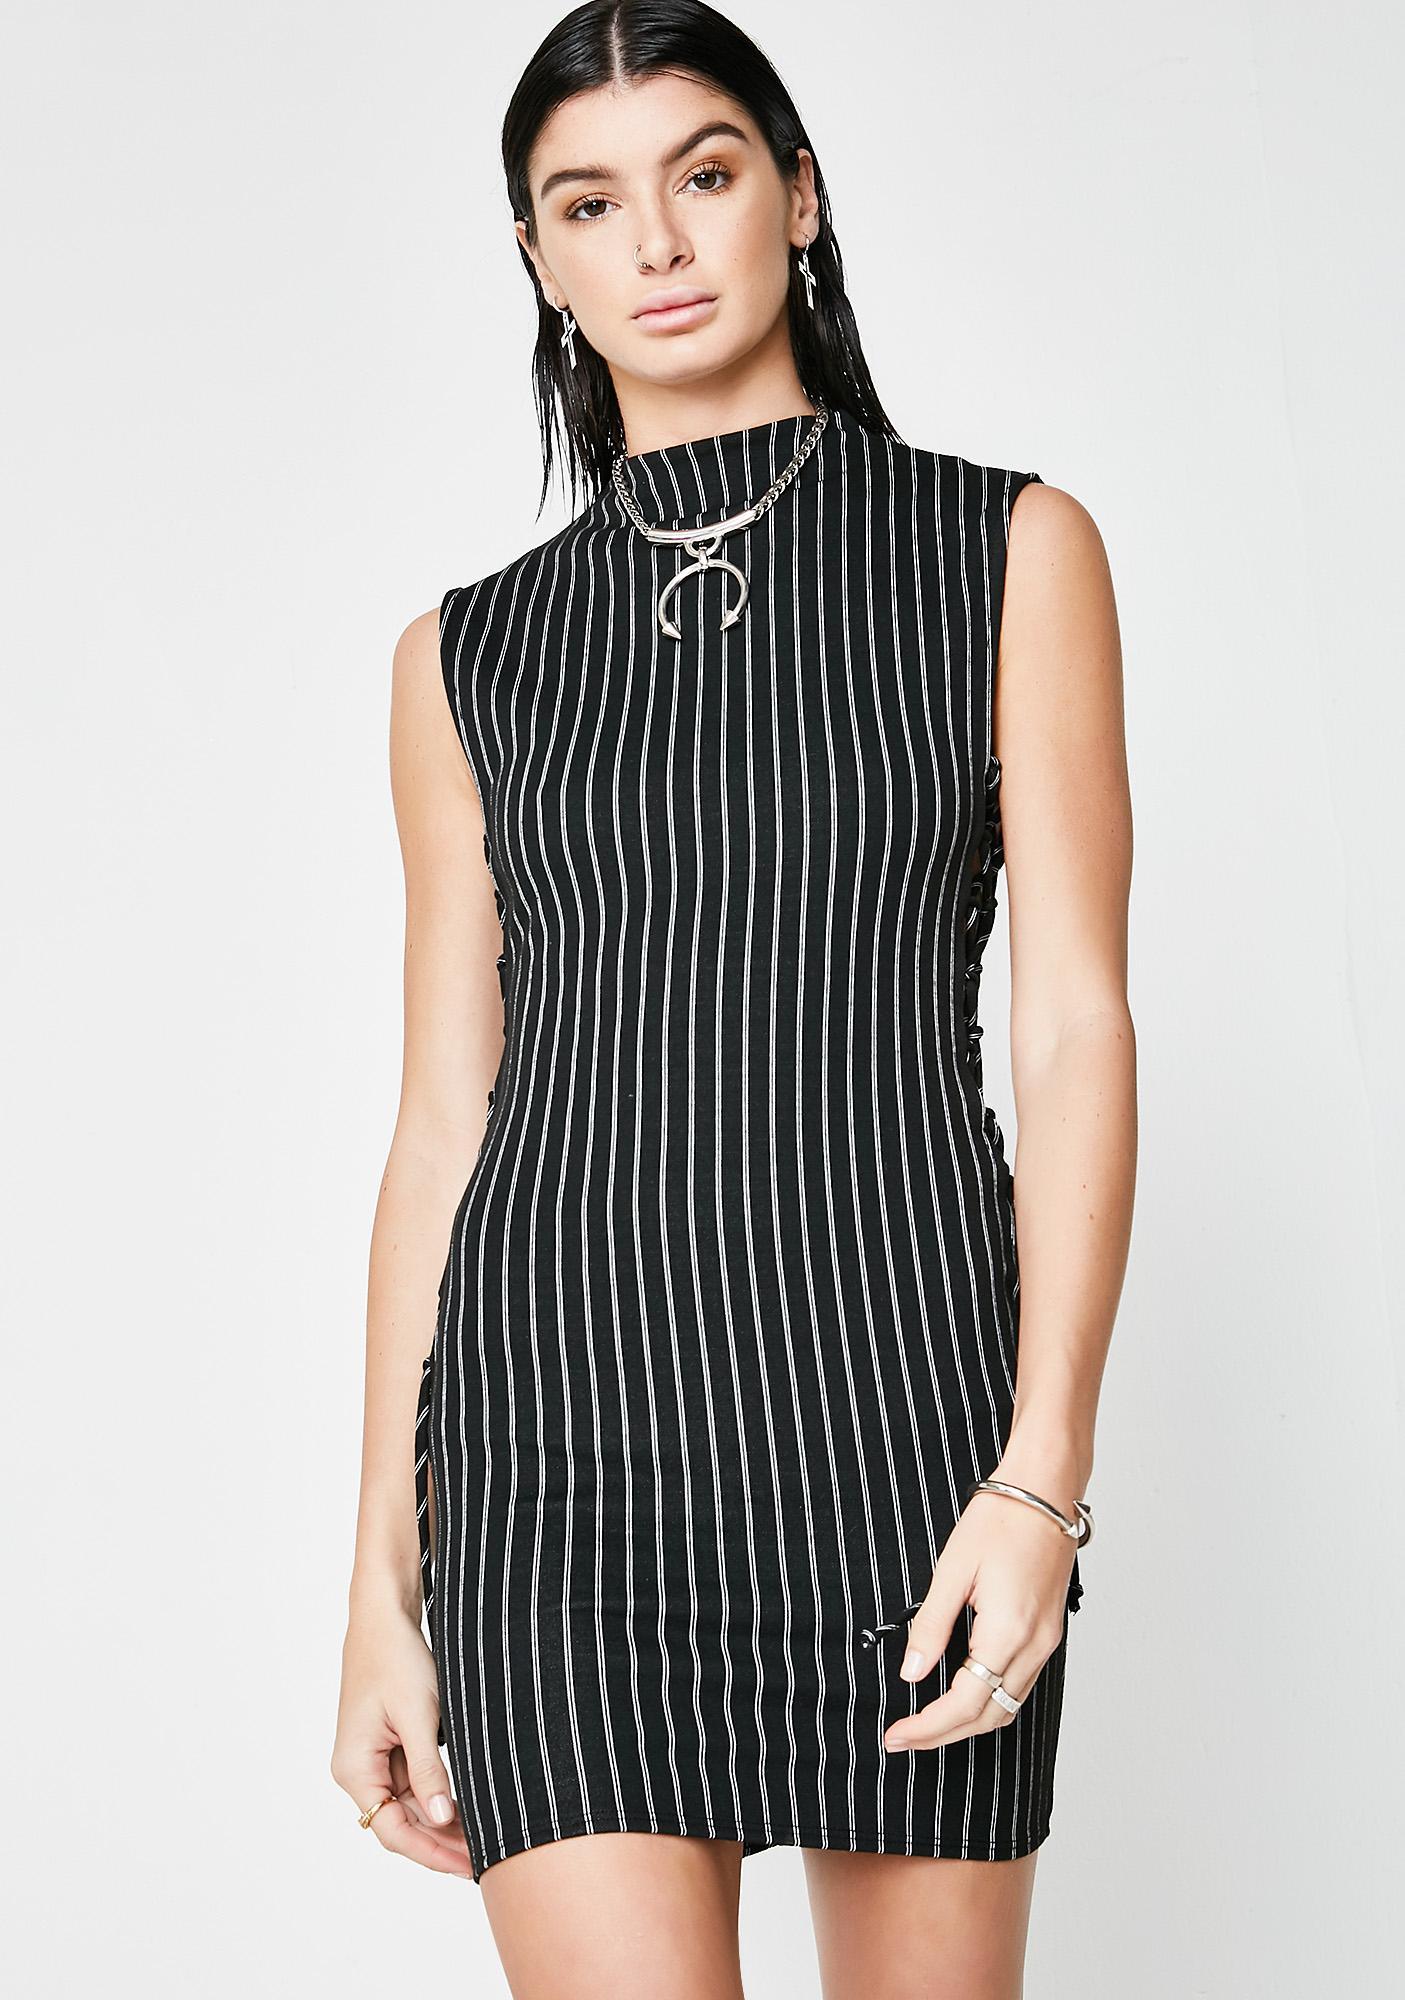 Play Harder Striped Dress